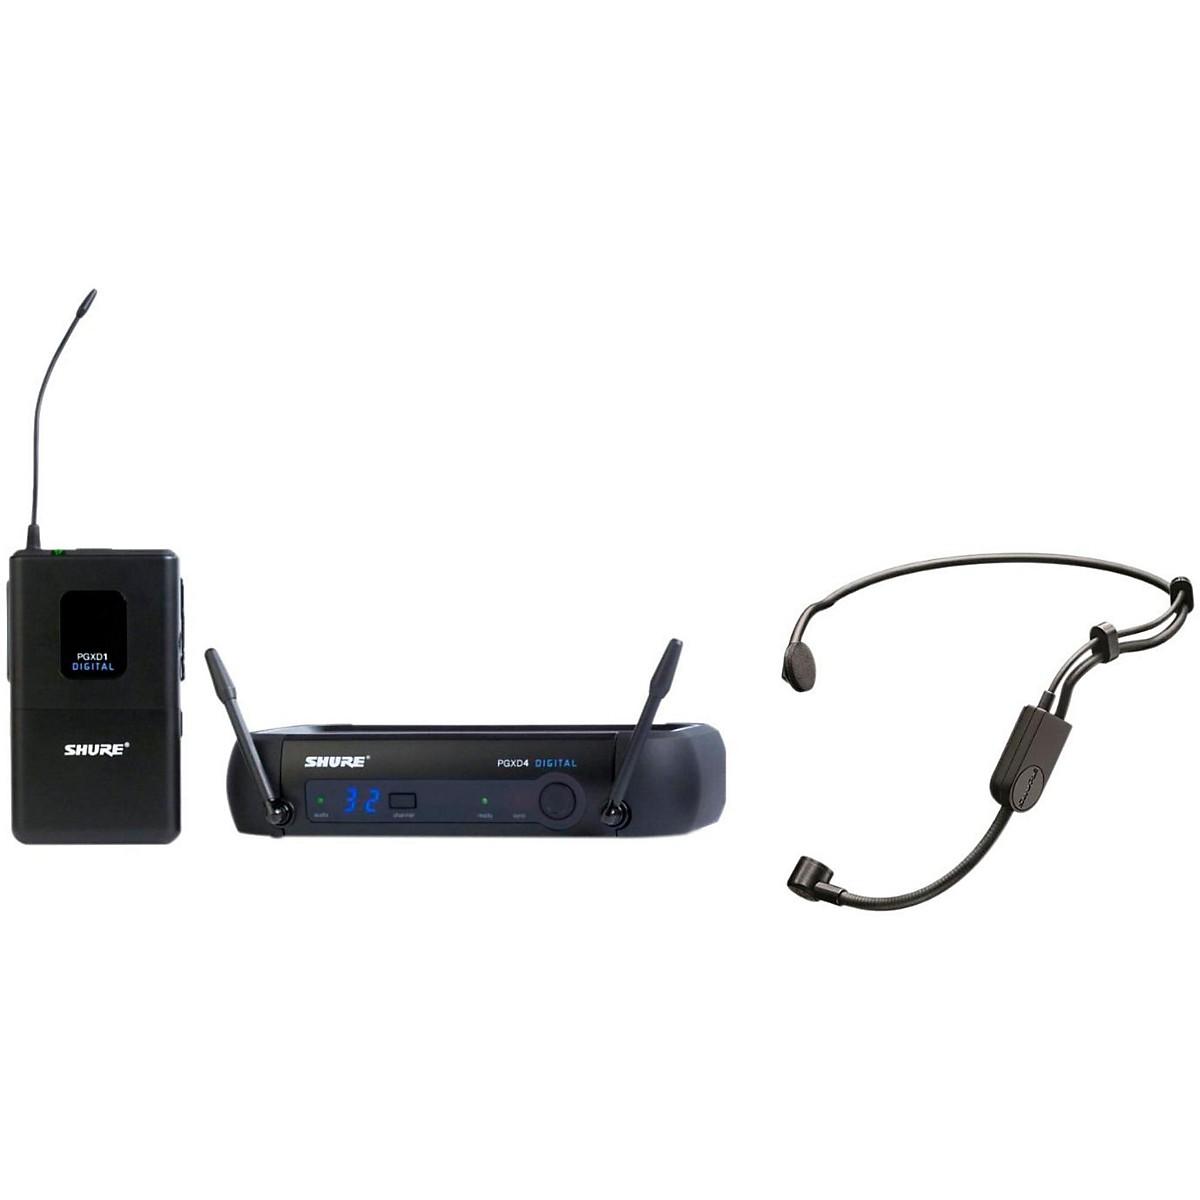 Shure PGX-D Digital Wireless Headset System